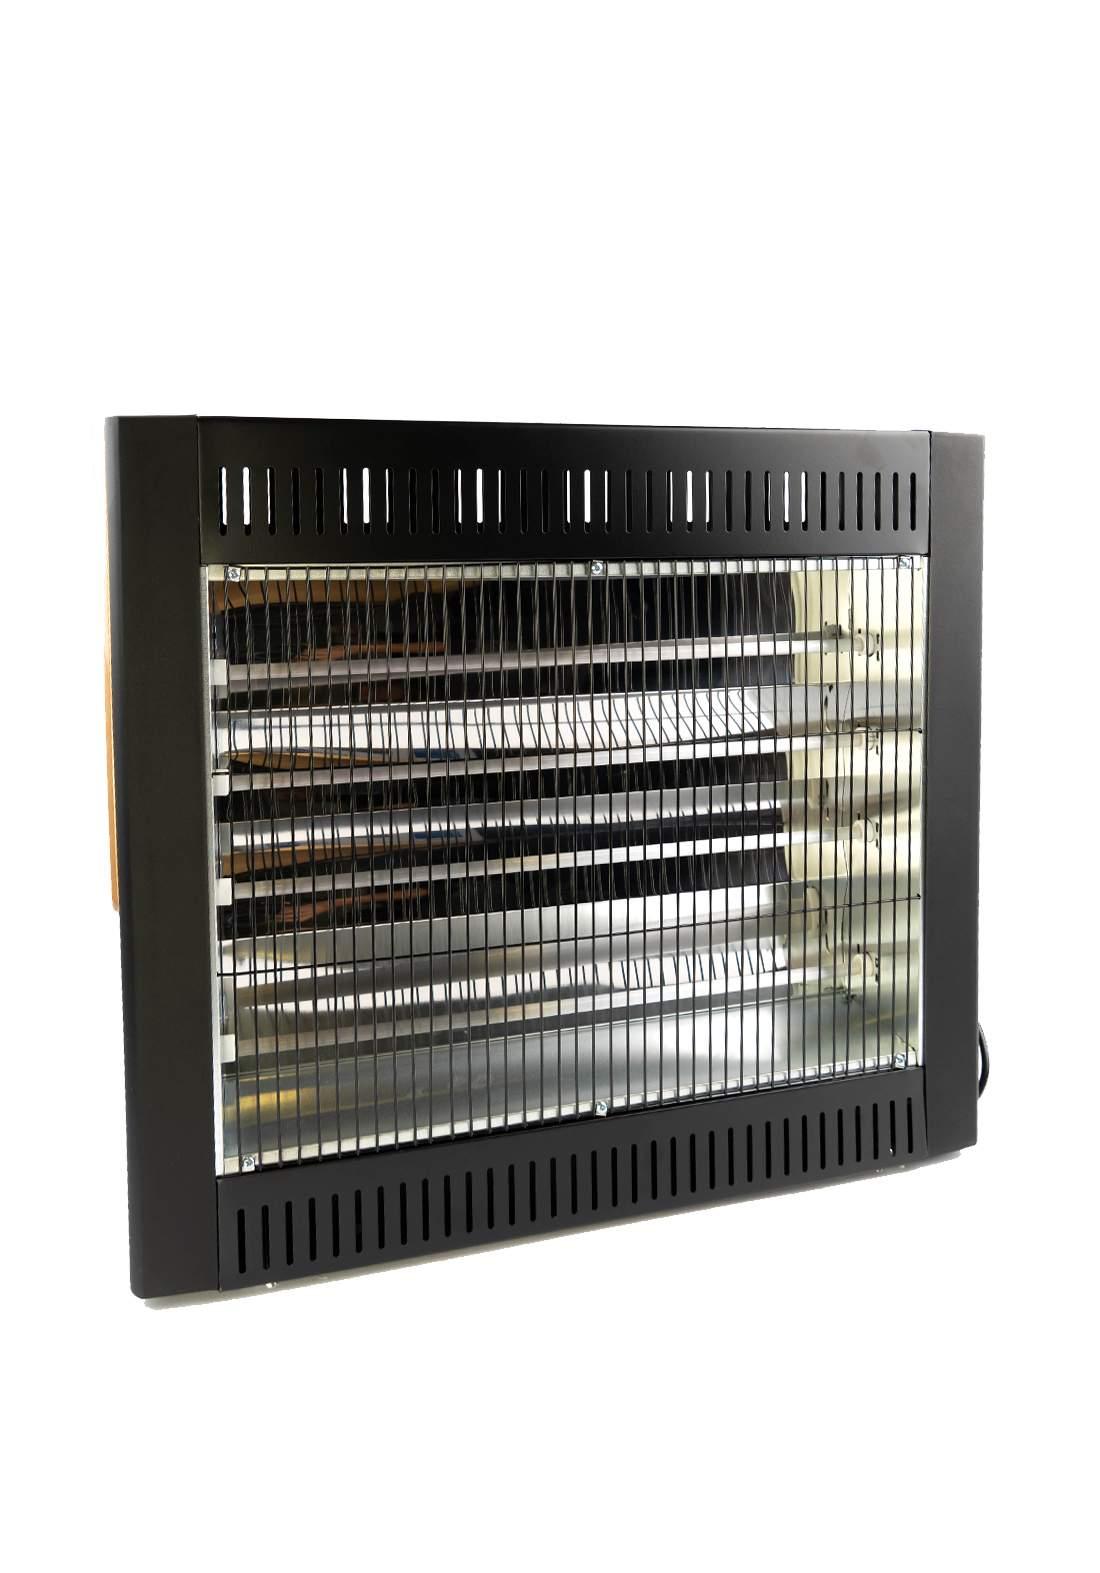 DecoVolt 6042 quartz Heater 1100-2200W مدفئة كوارتز 1100-2200 واط 4 شمعات